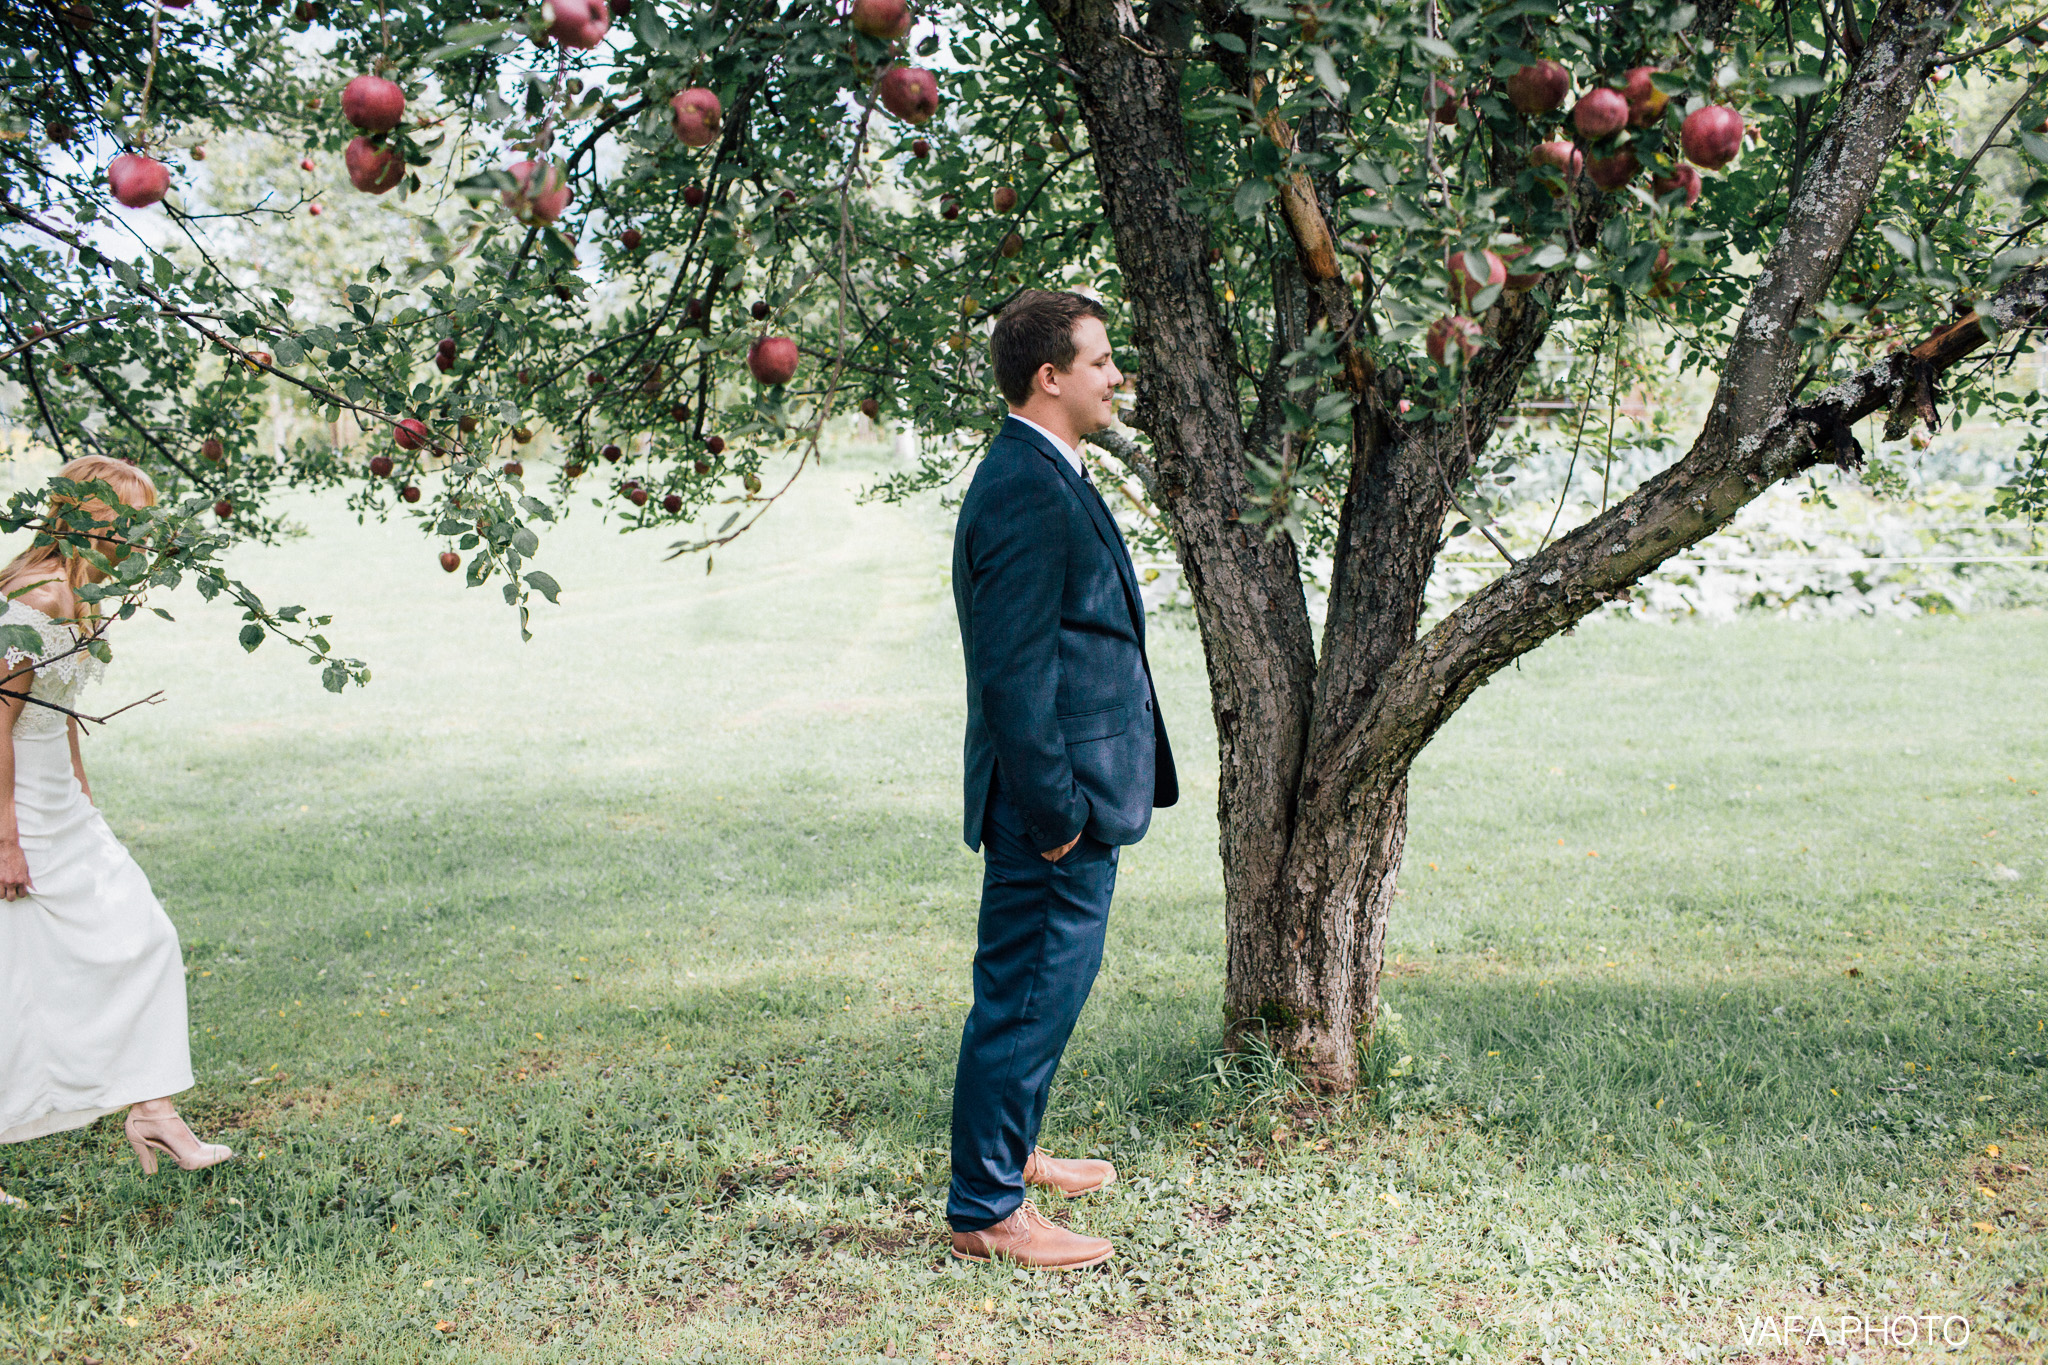 Belsolda-Farm-Wedding-Christy-Eric-Vafa-Photo-30.jpg